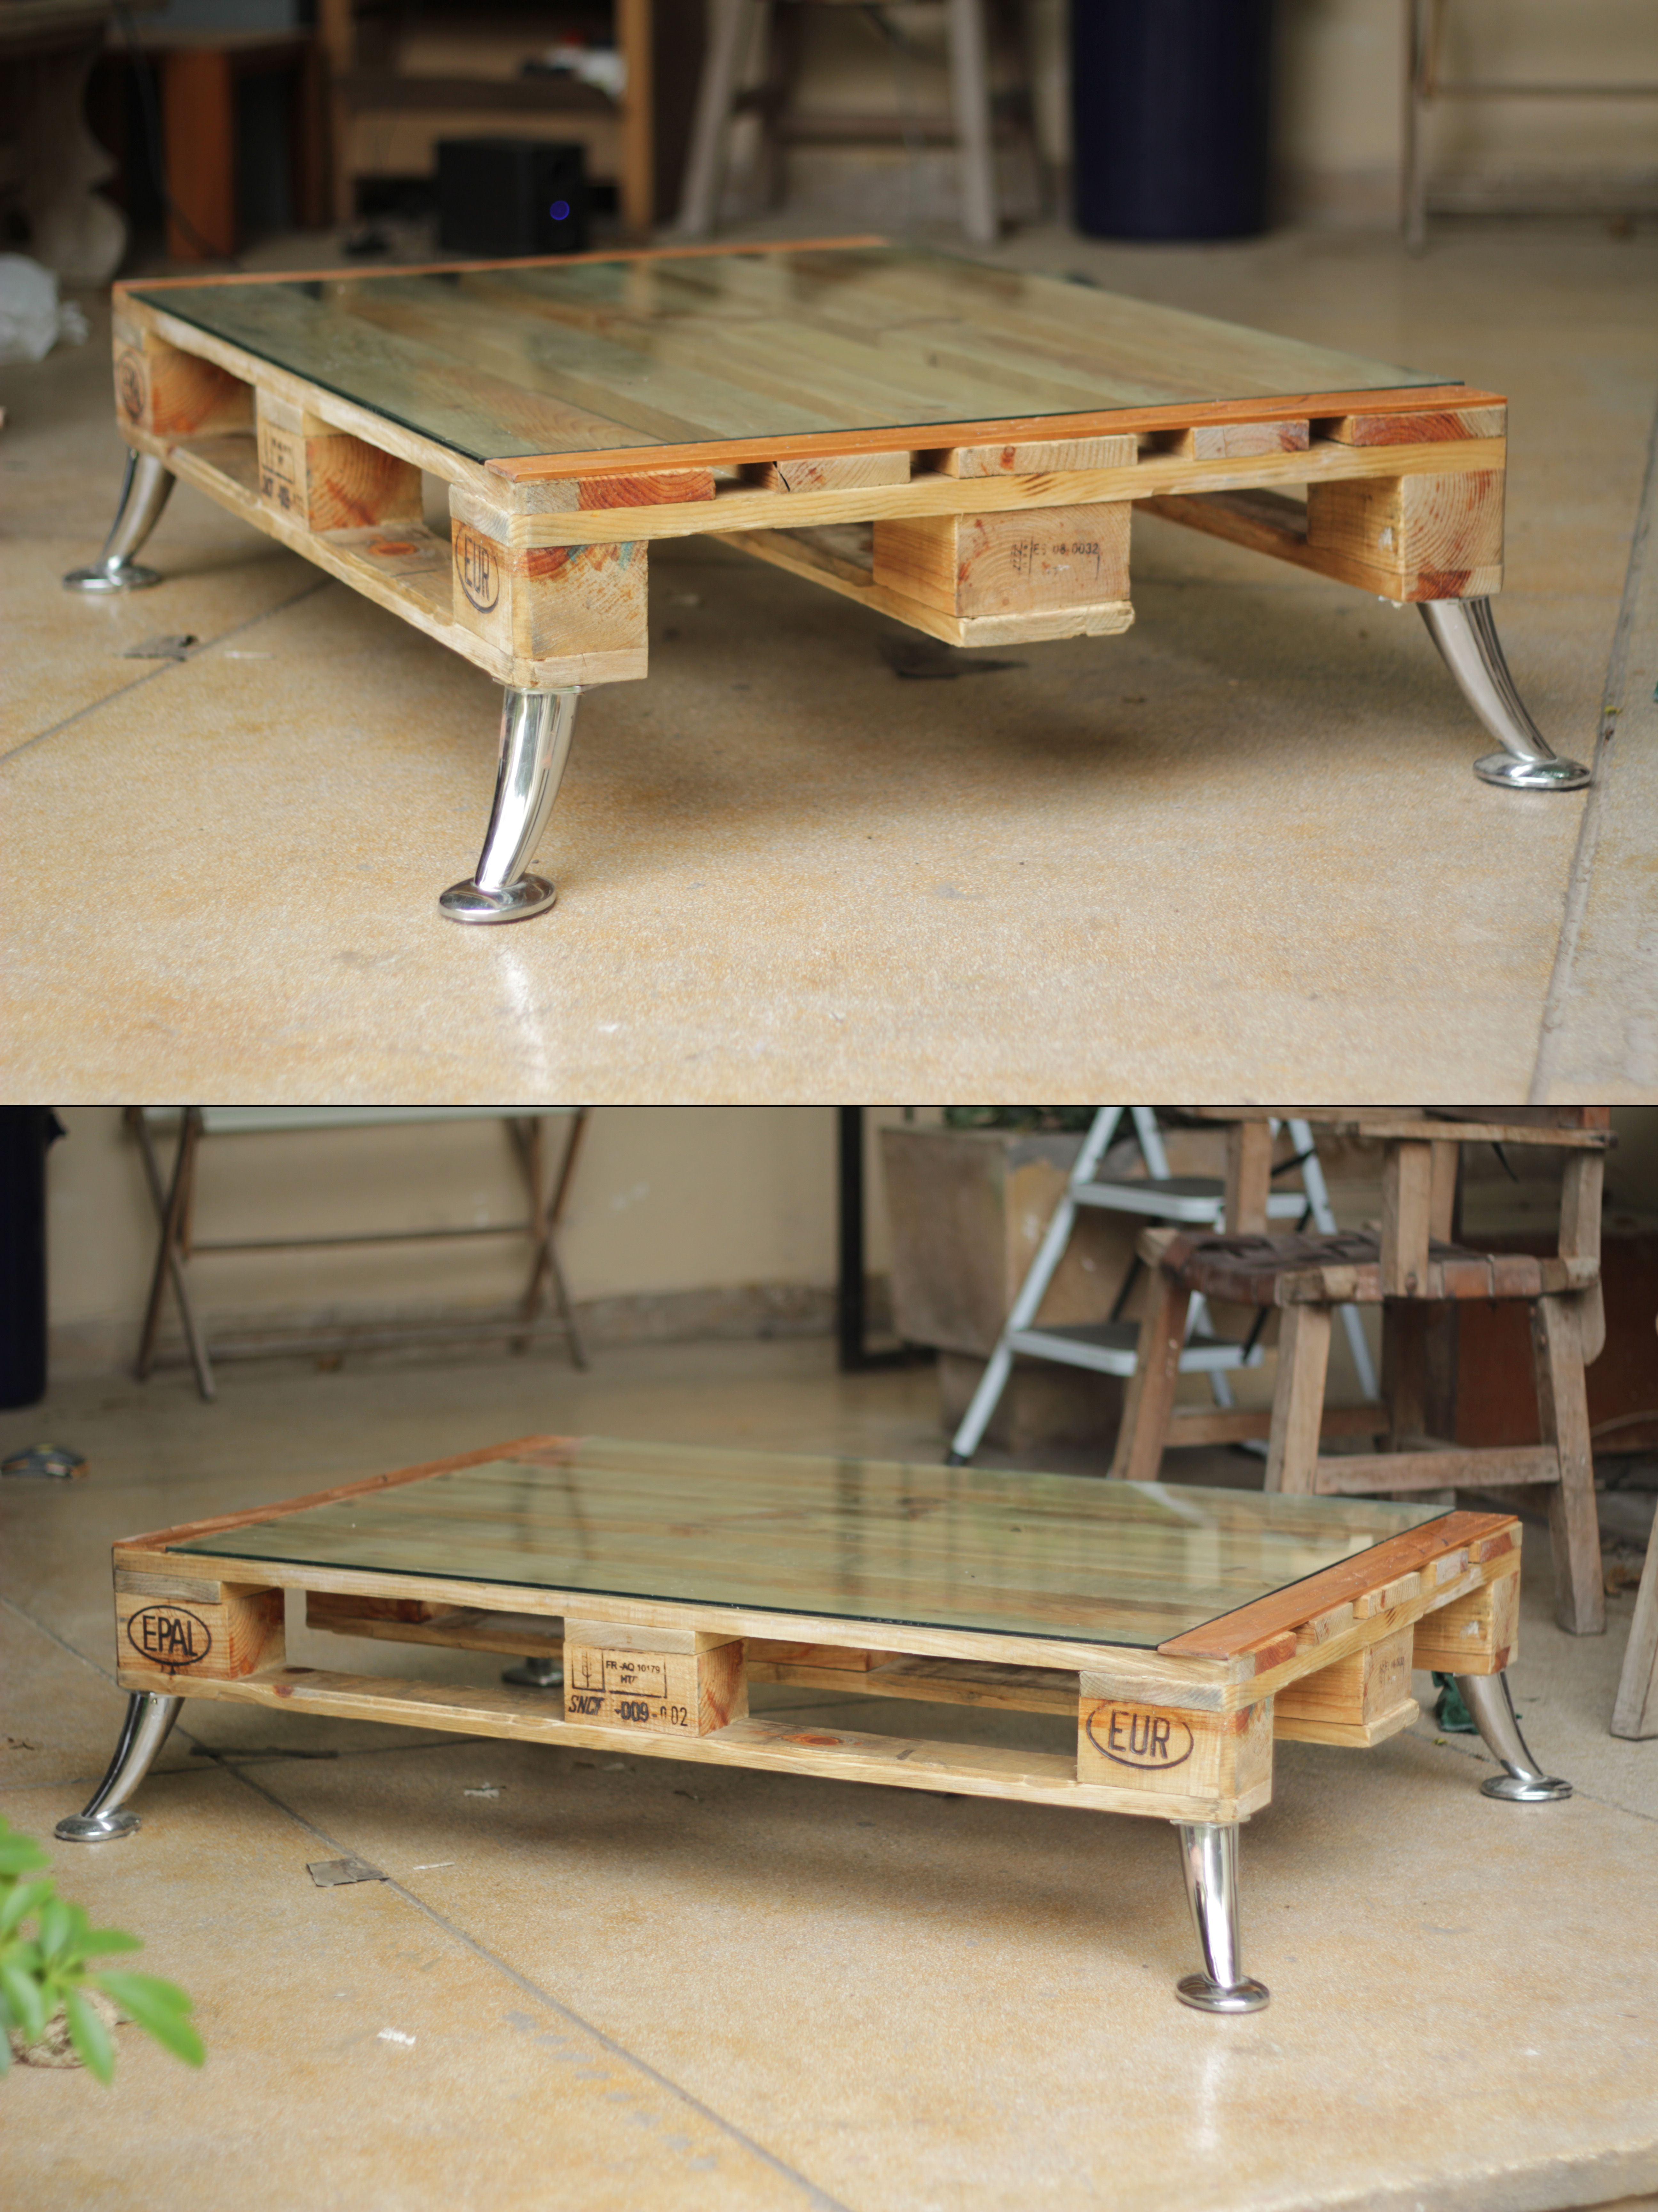 4dfeb0f157c8700bbdc3142a65b8cffd Impressionnant De Table Basse originale Concept